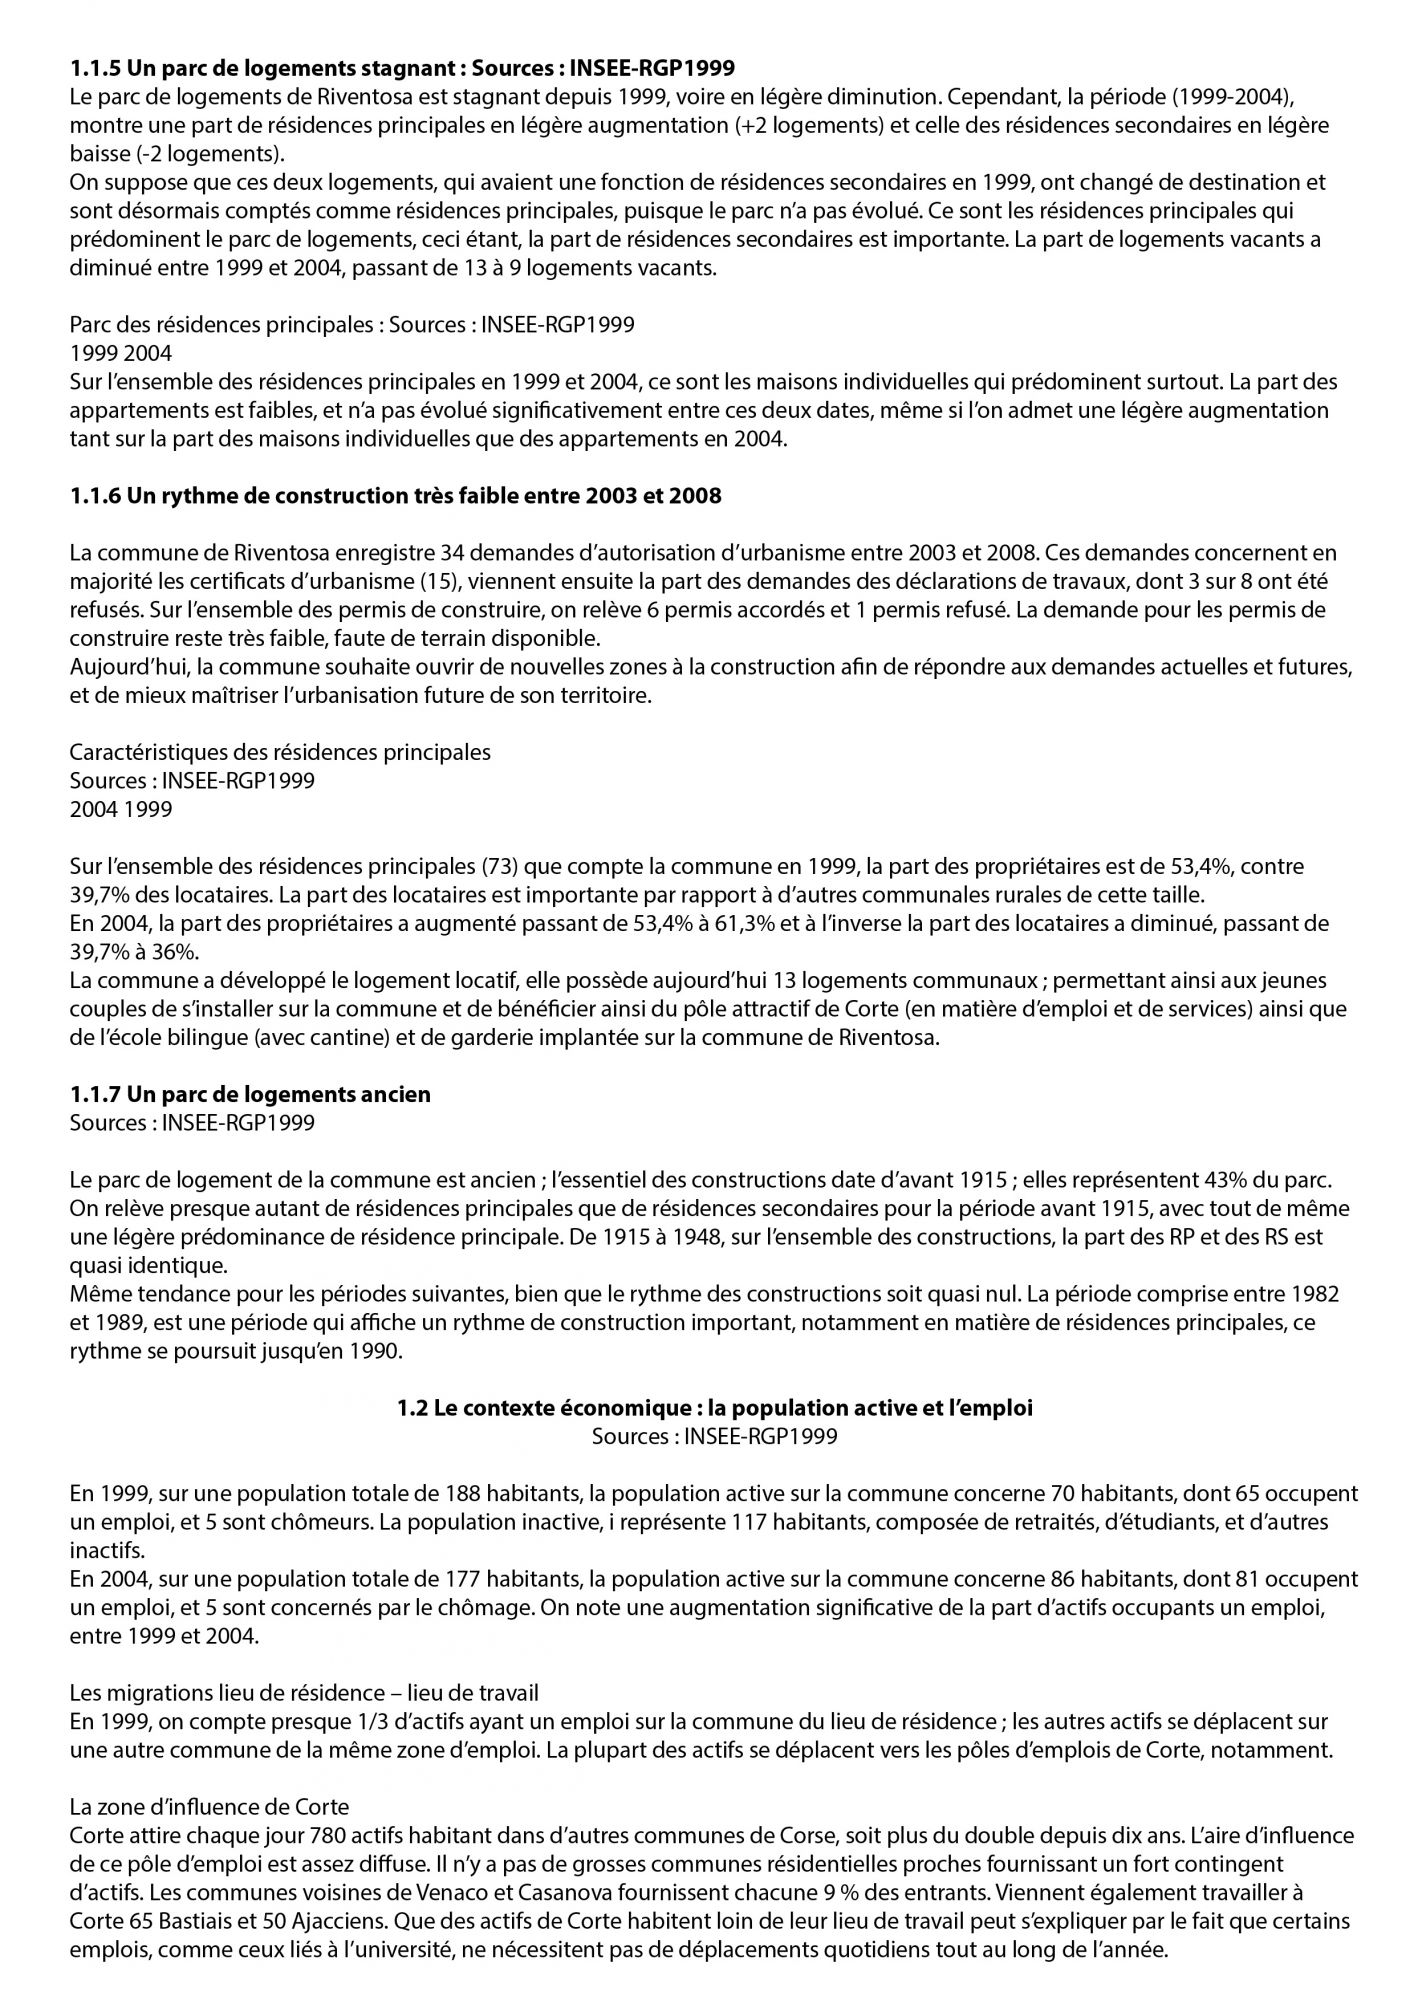 texte-carte-communale-5